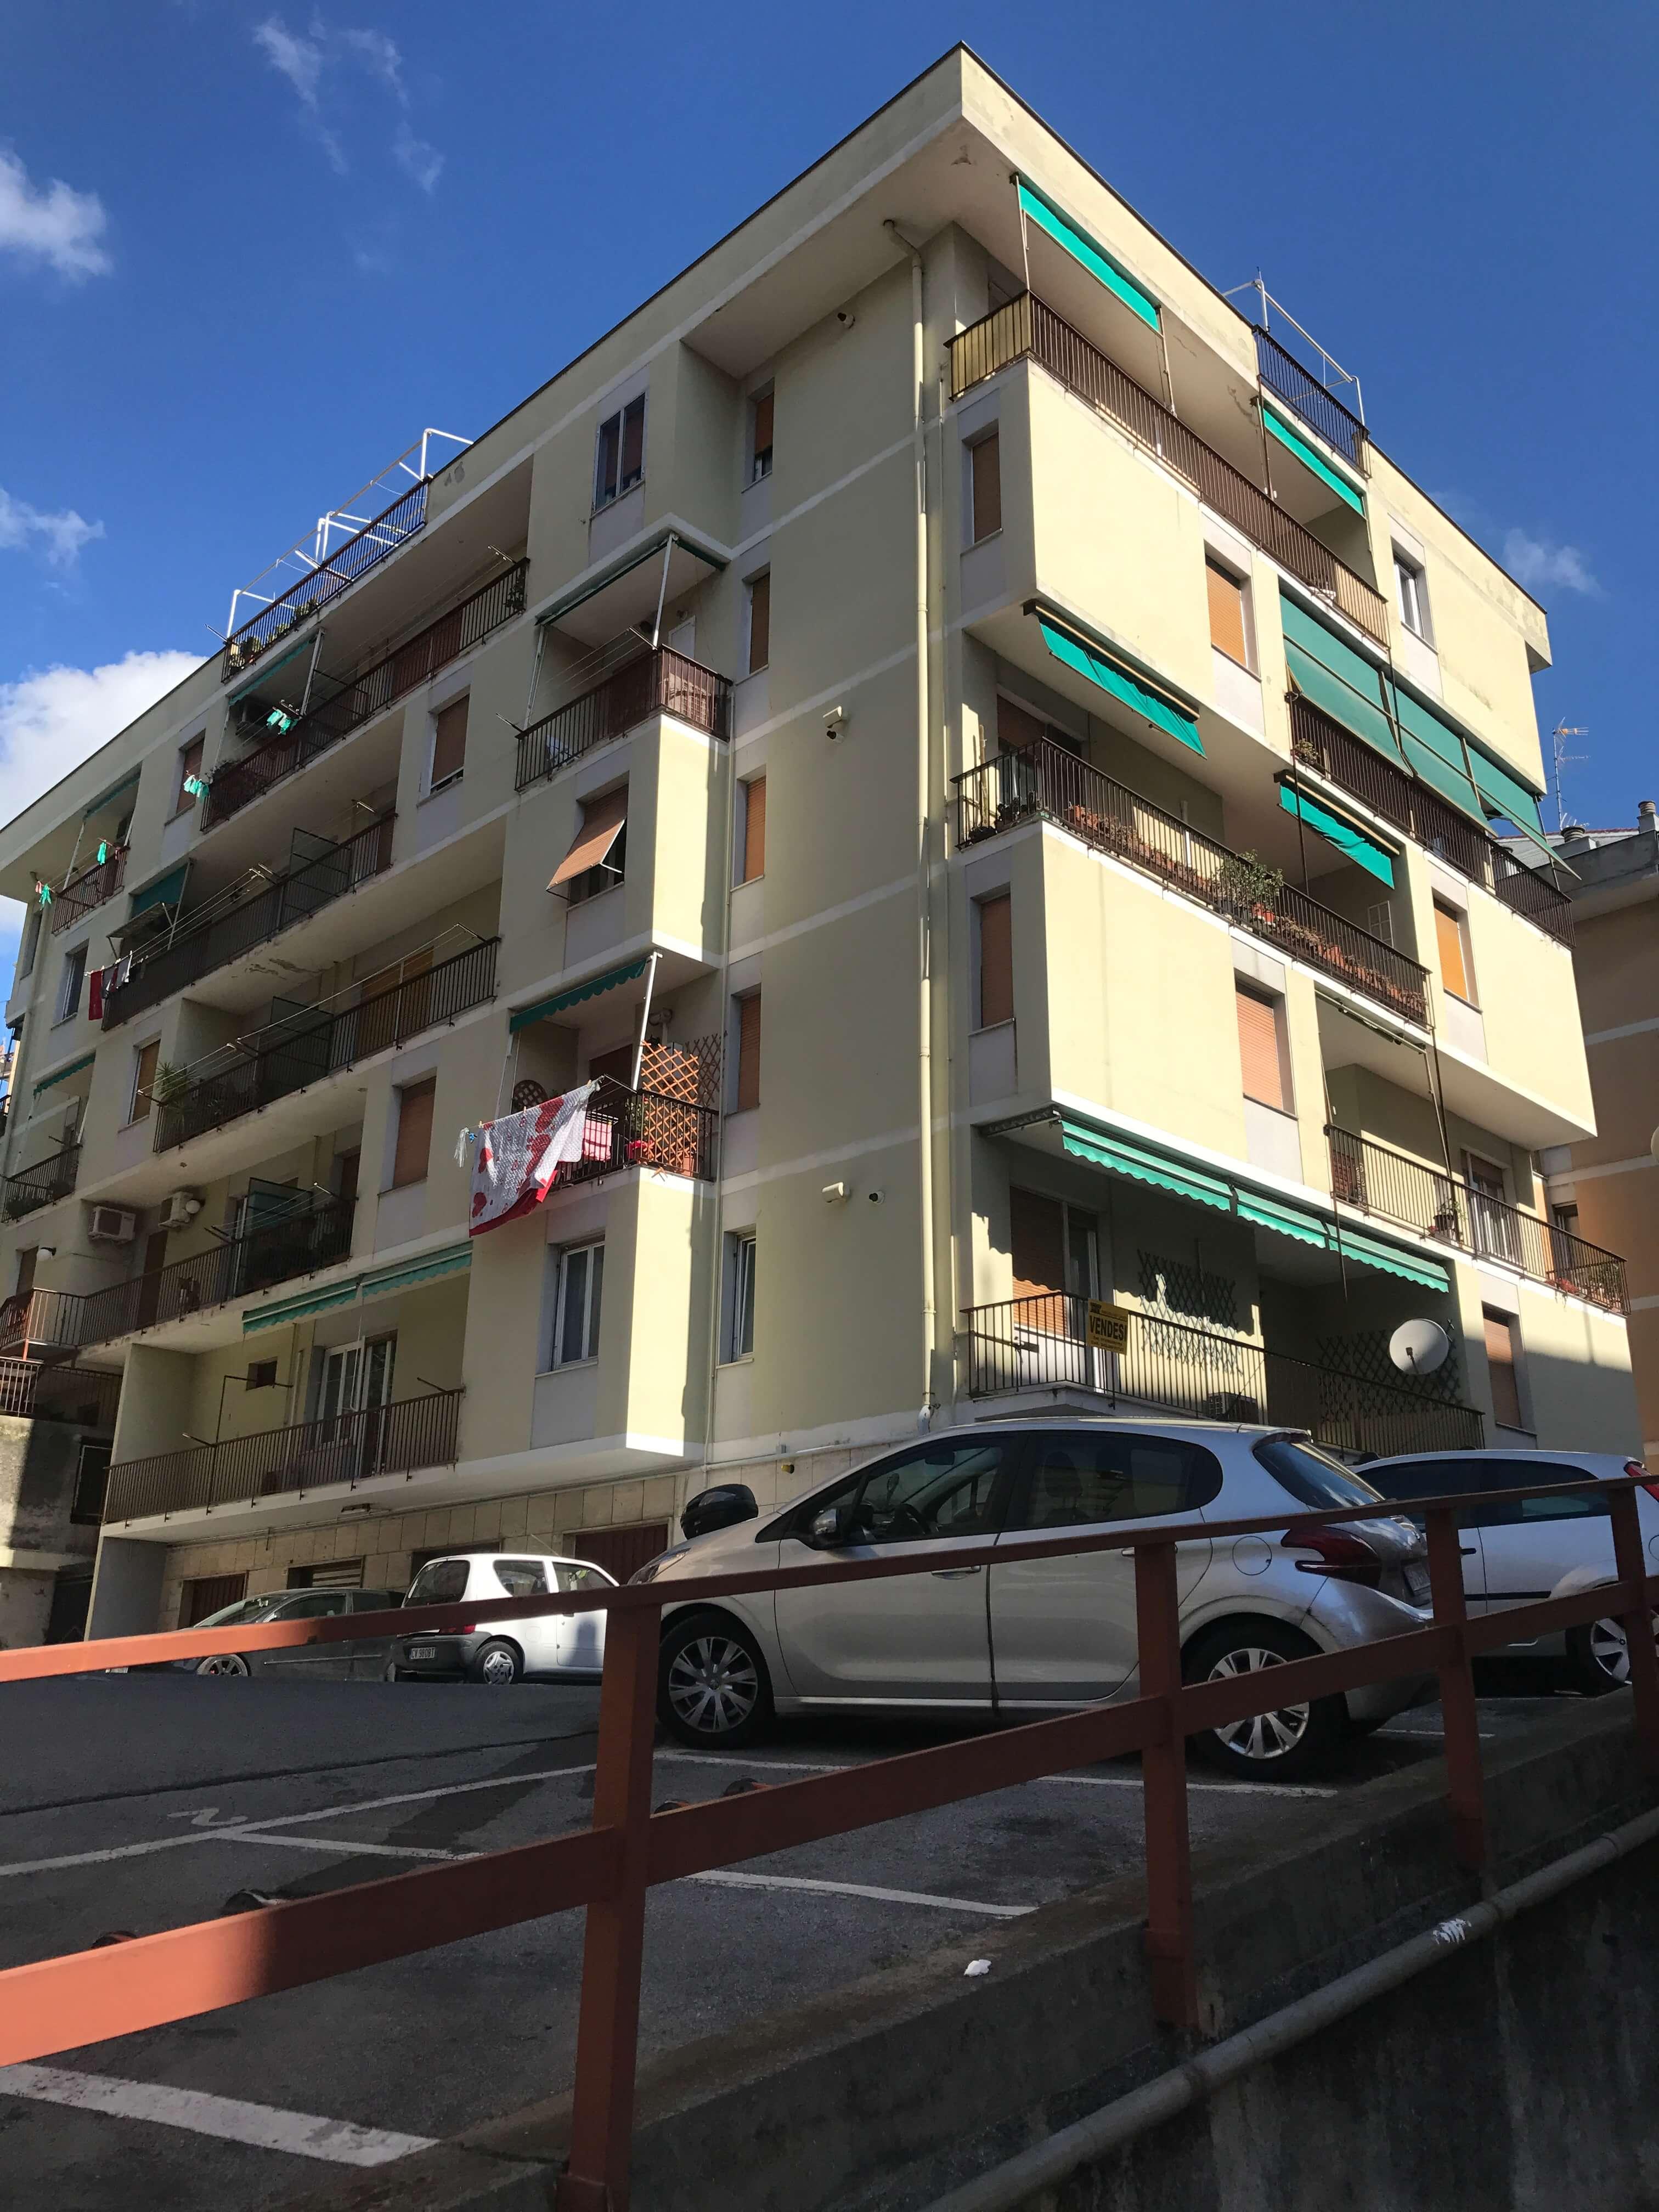 Arredo Bagno Genova Sestri Ponente.Genova Sestri Ponente Vendesi 7 Vani Con Posto Auto